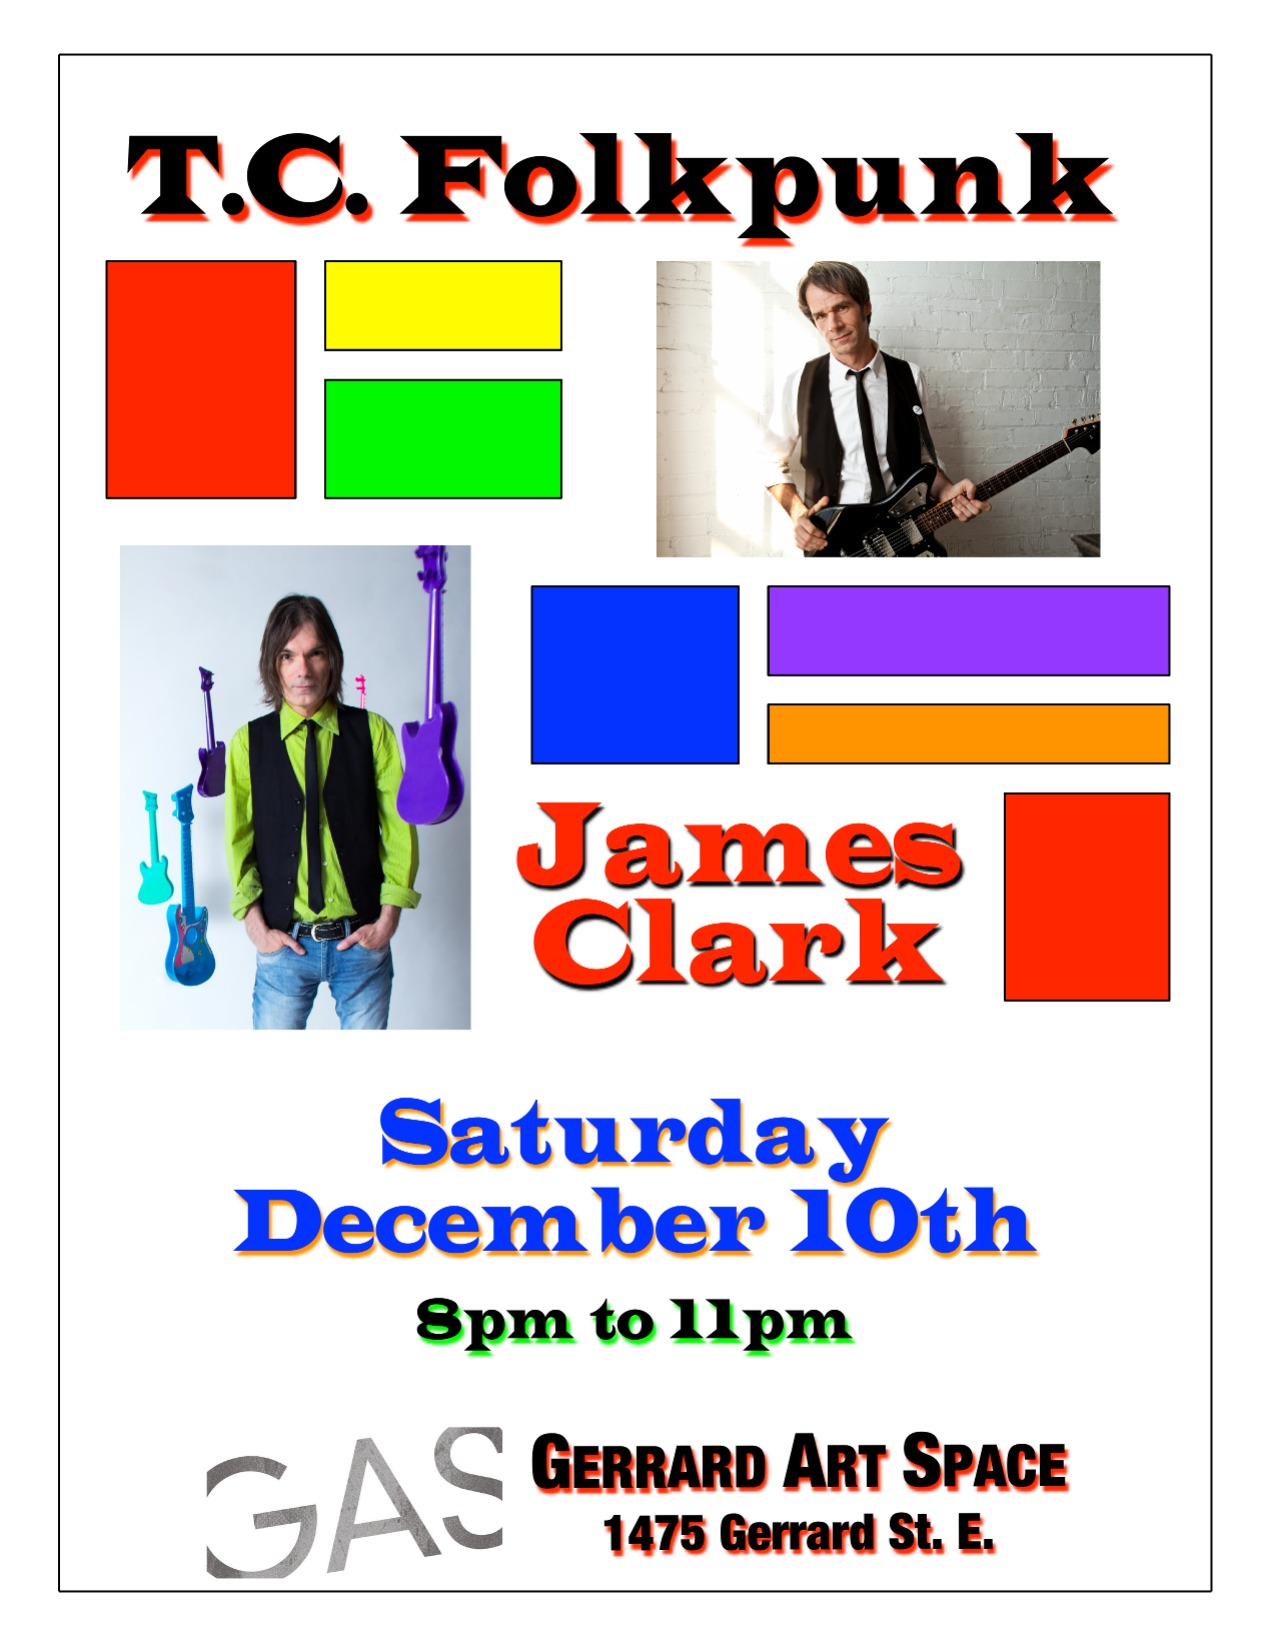 T.C. Folkpunk + James Clark 2016